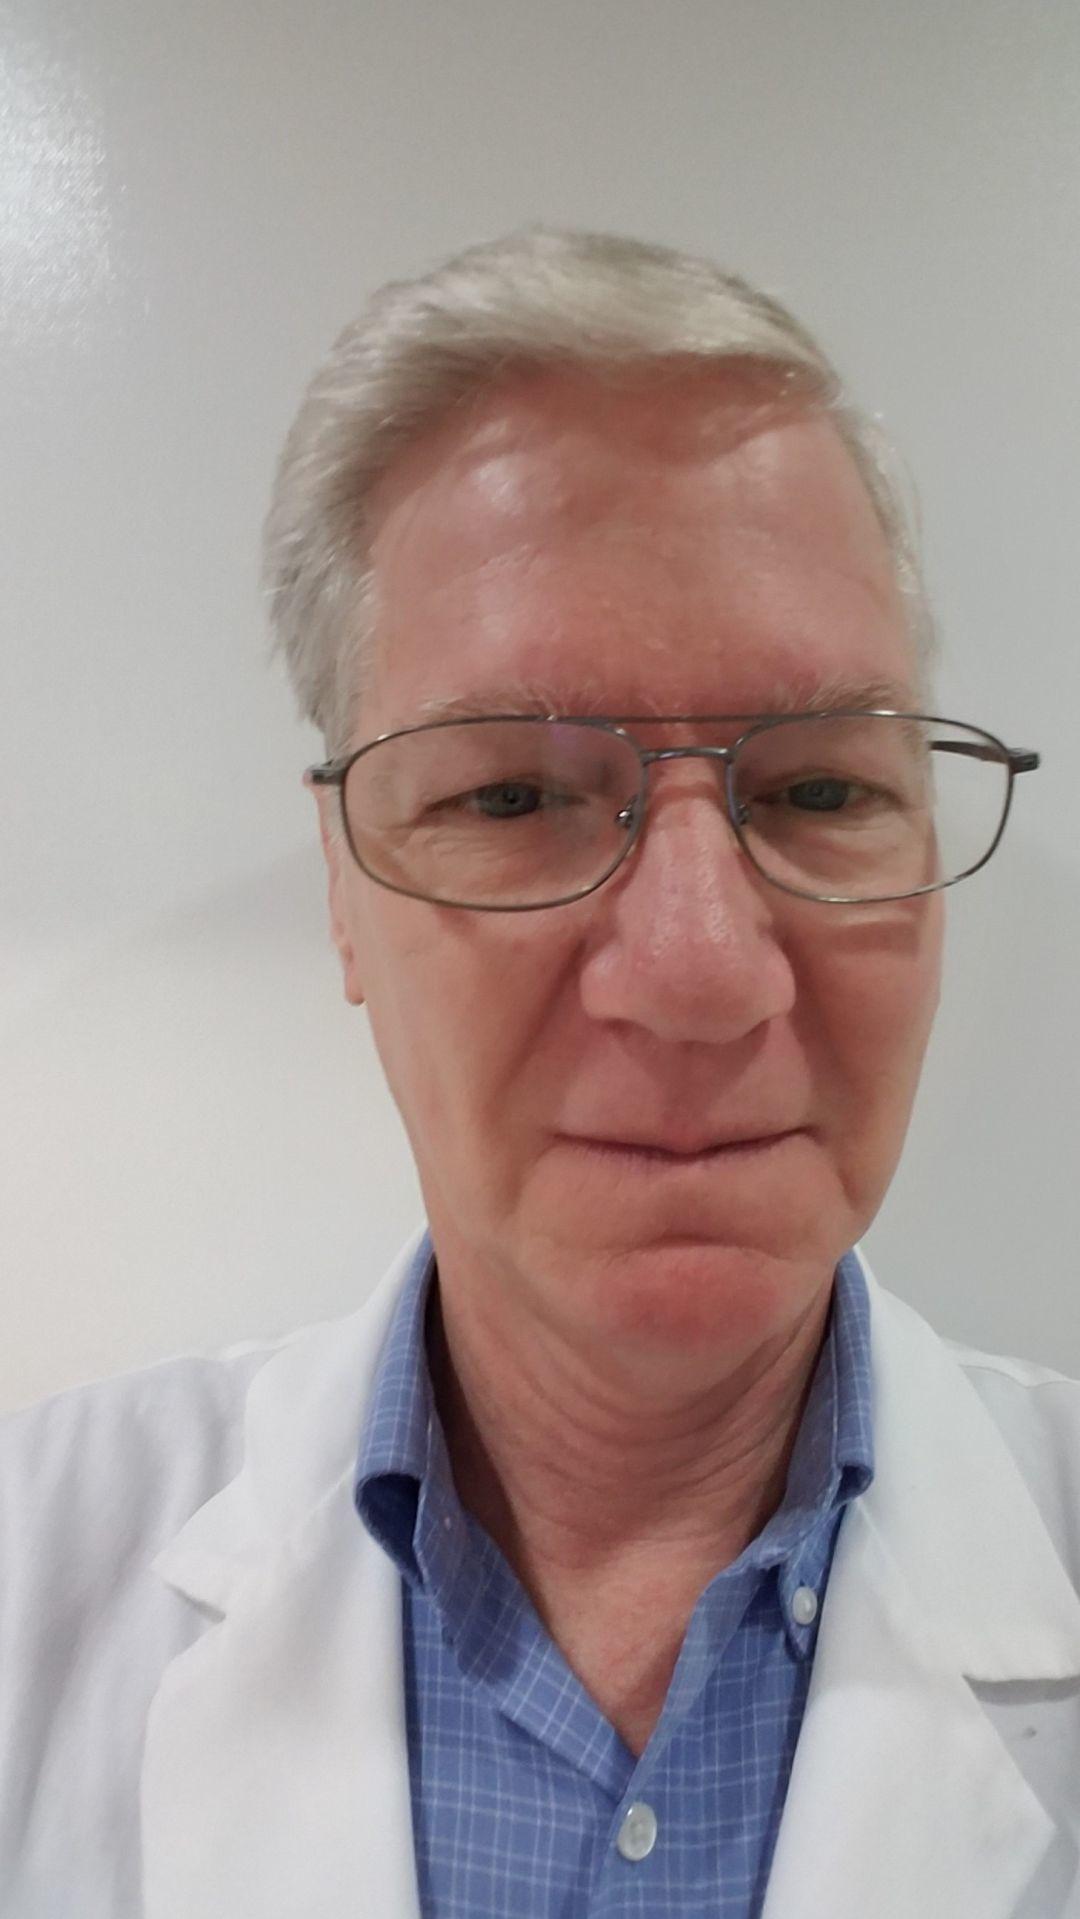 Jerry Bayer headshot